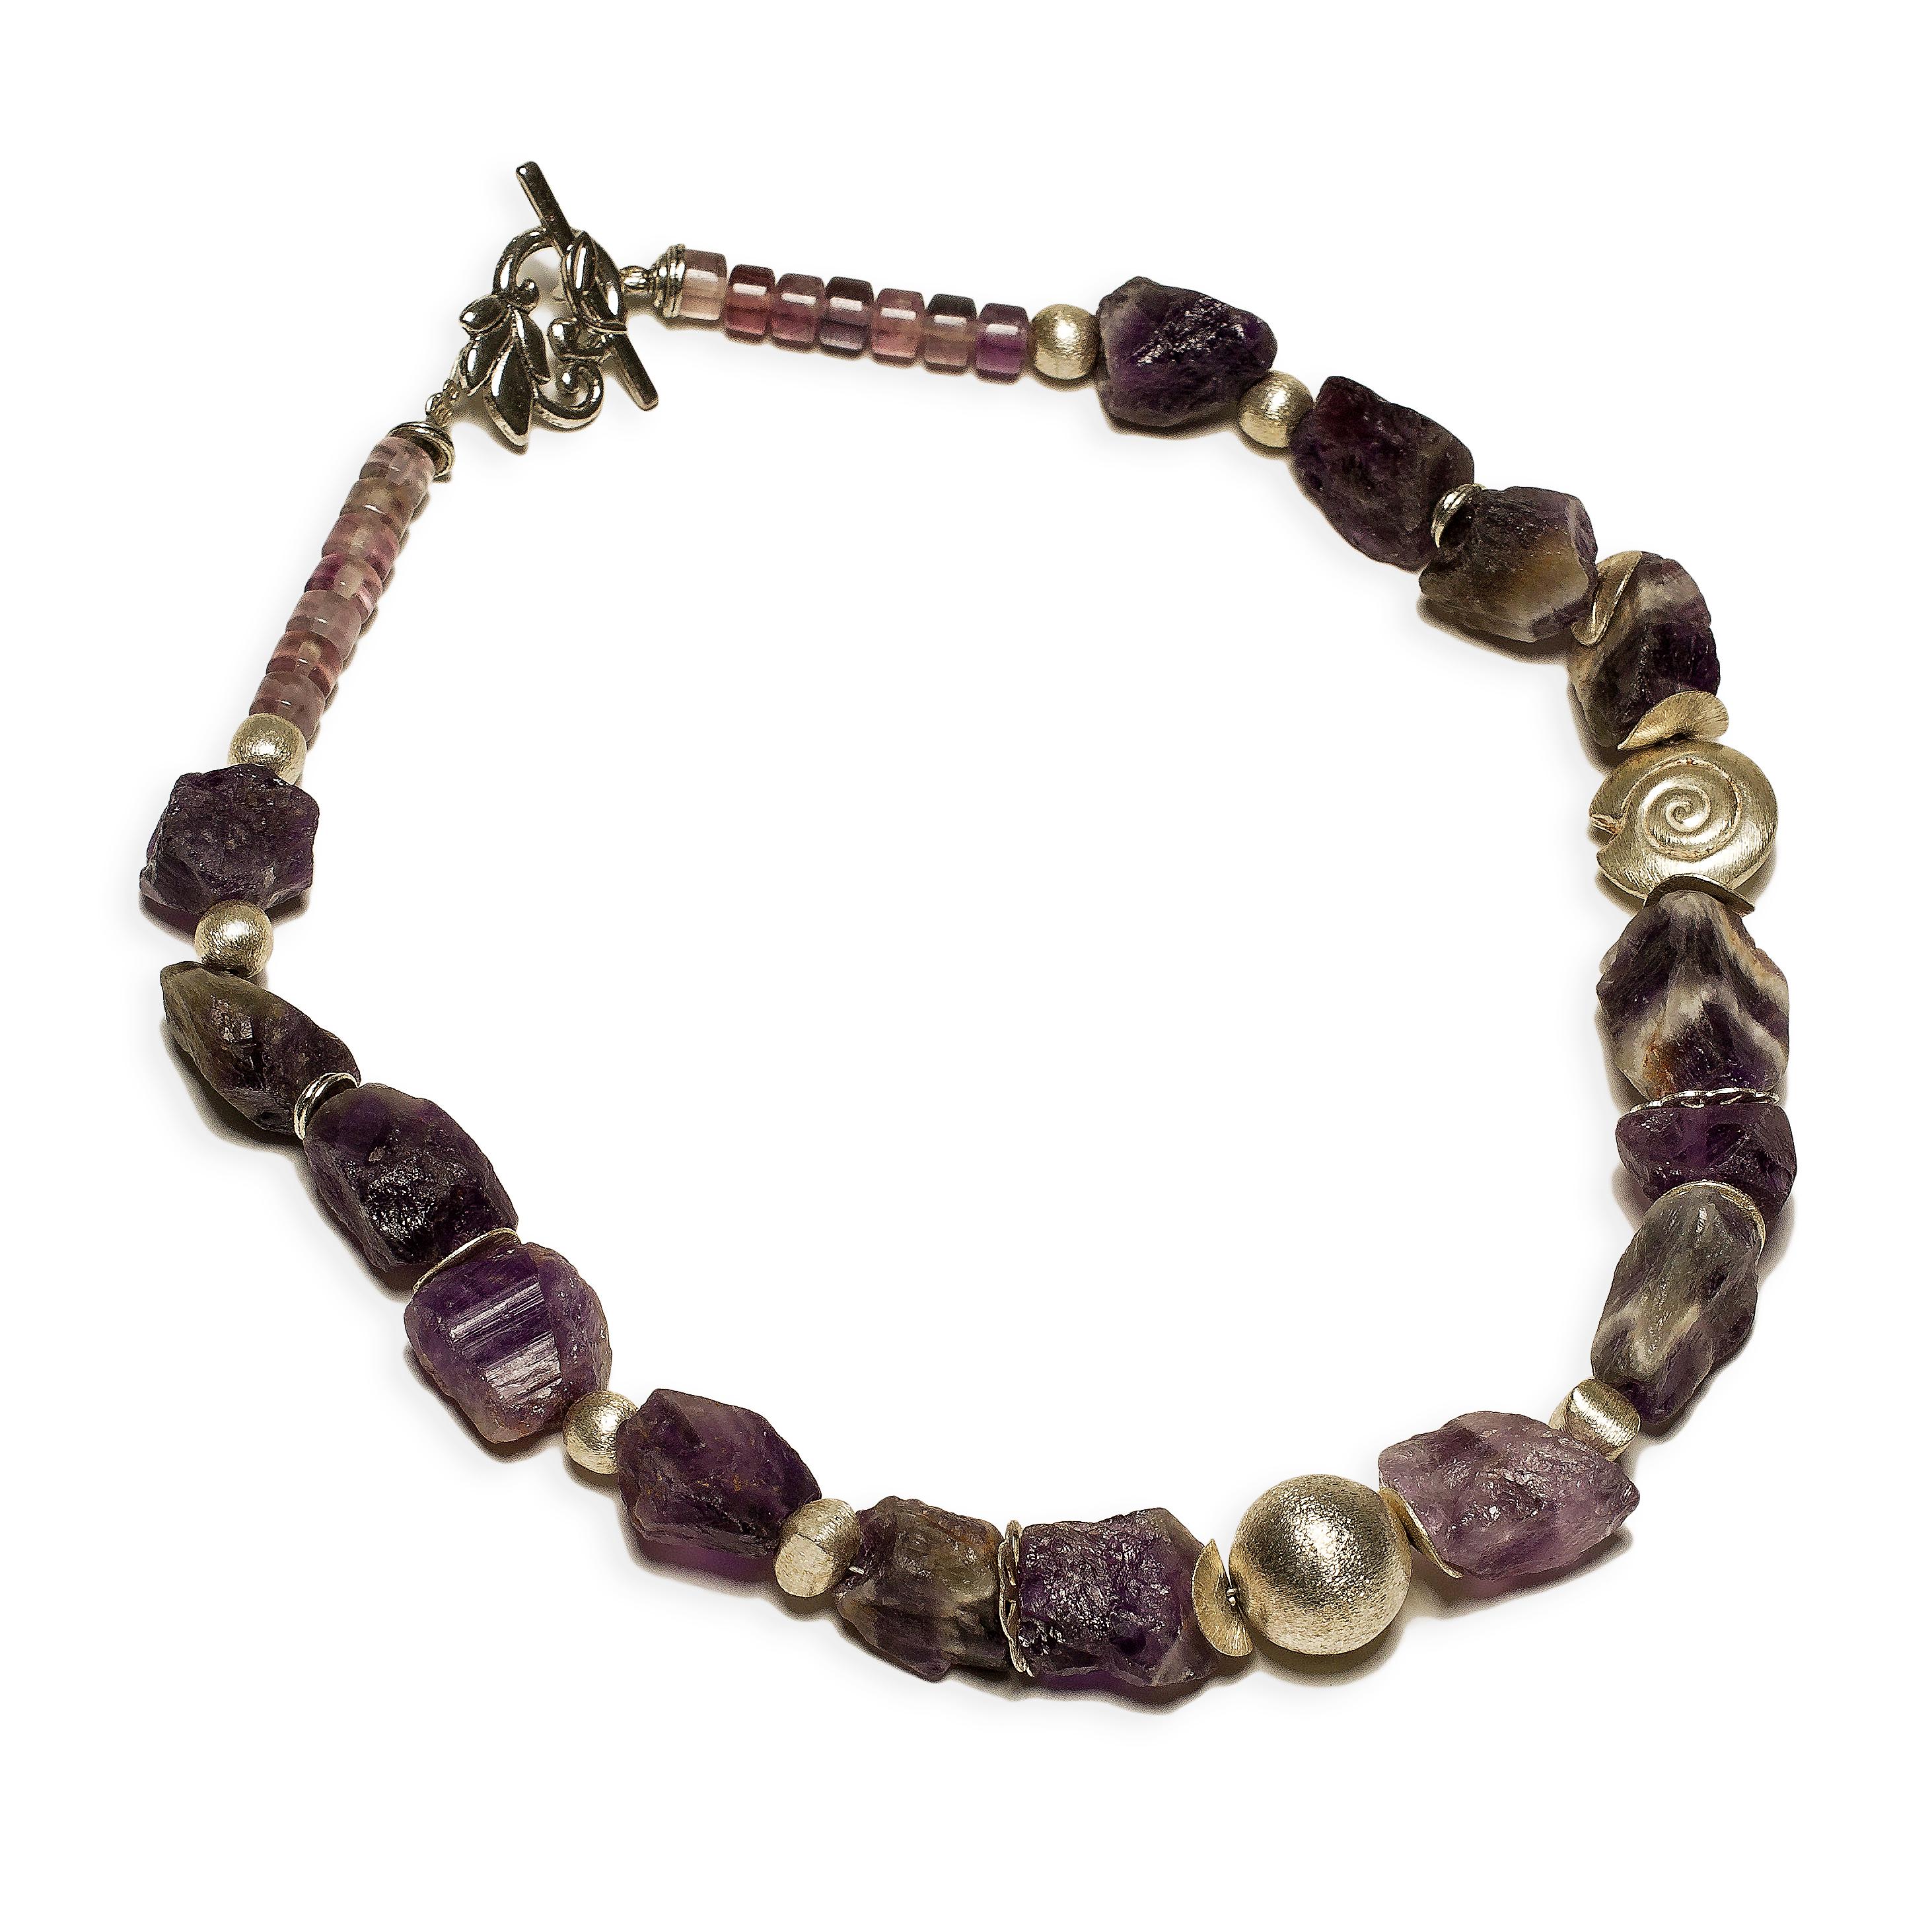 Packshoty - biżuteria_040